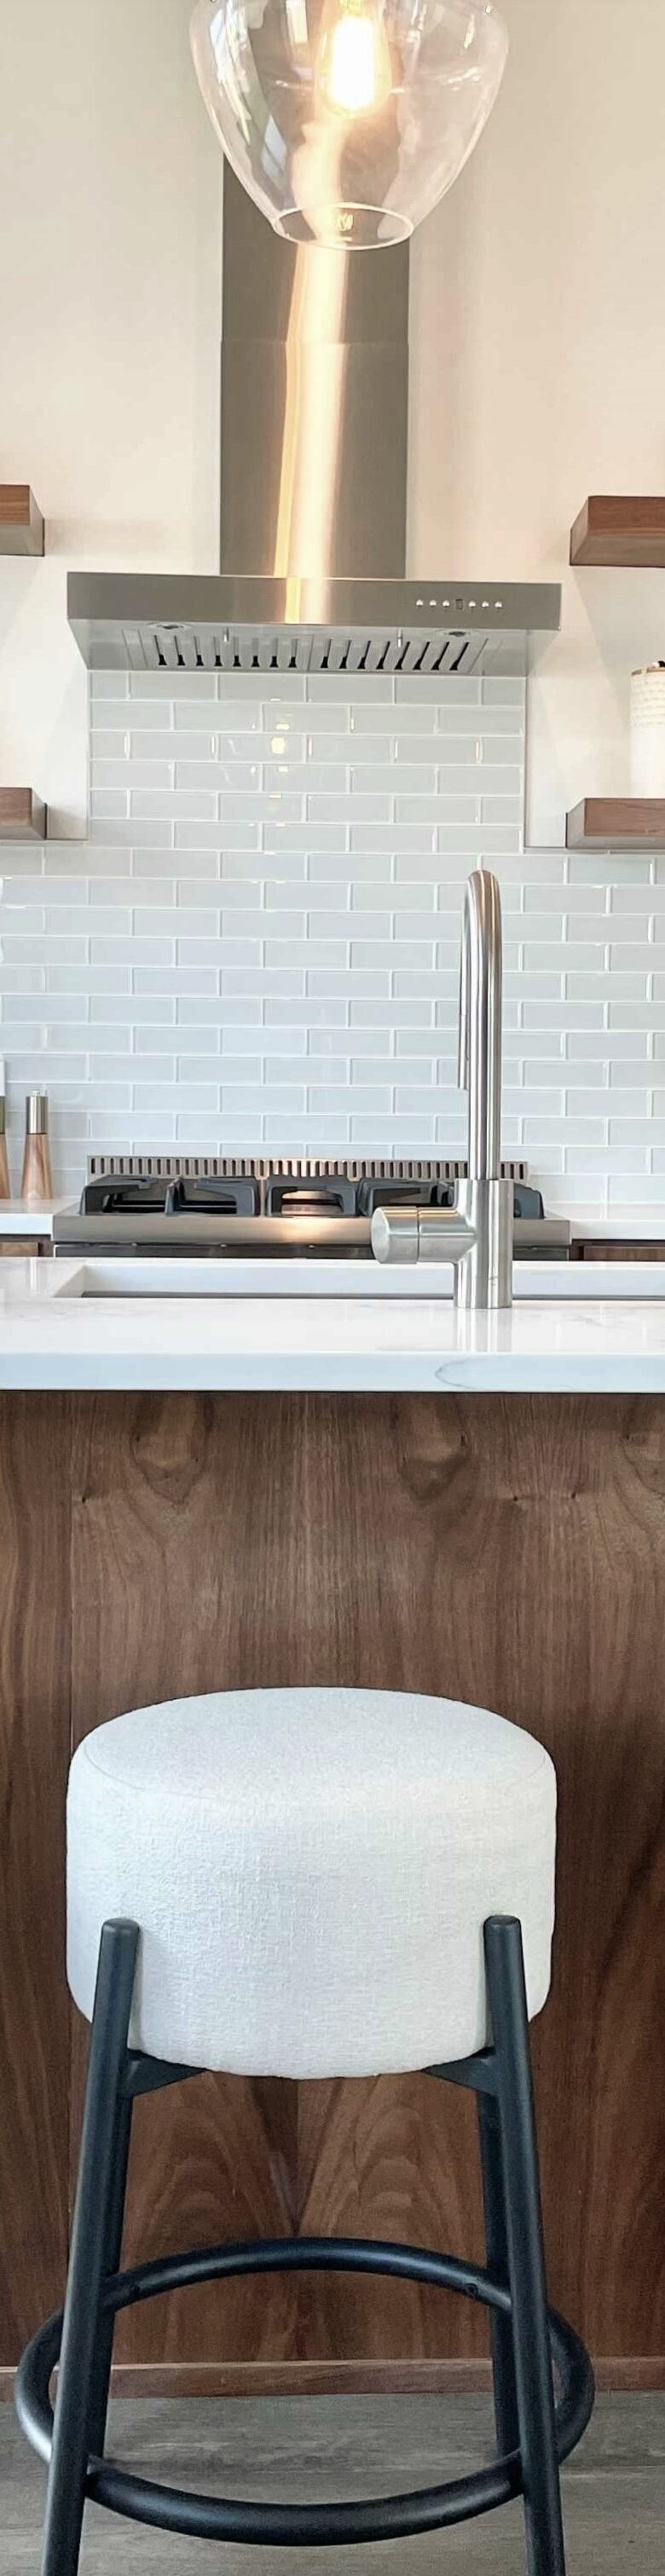 AlphaBuildersGroup-AustinTexas-Homebuilder-custom-cabinets-kitchen-island